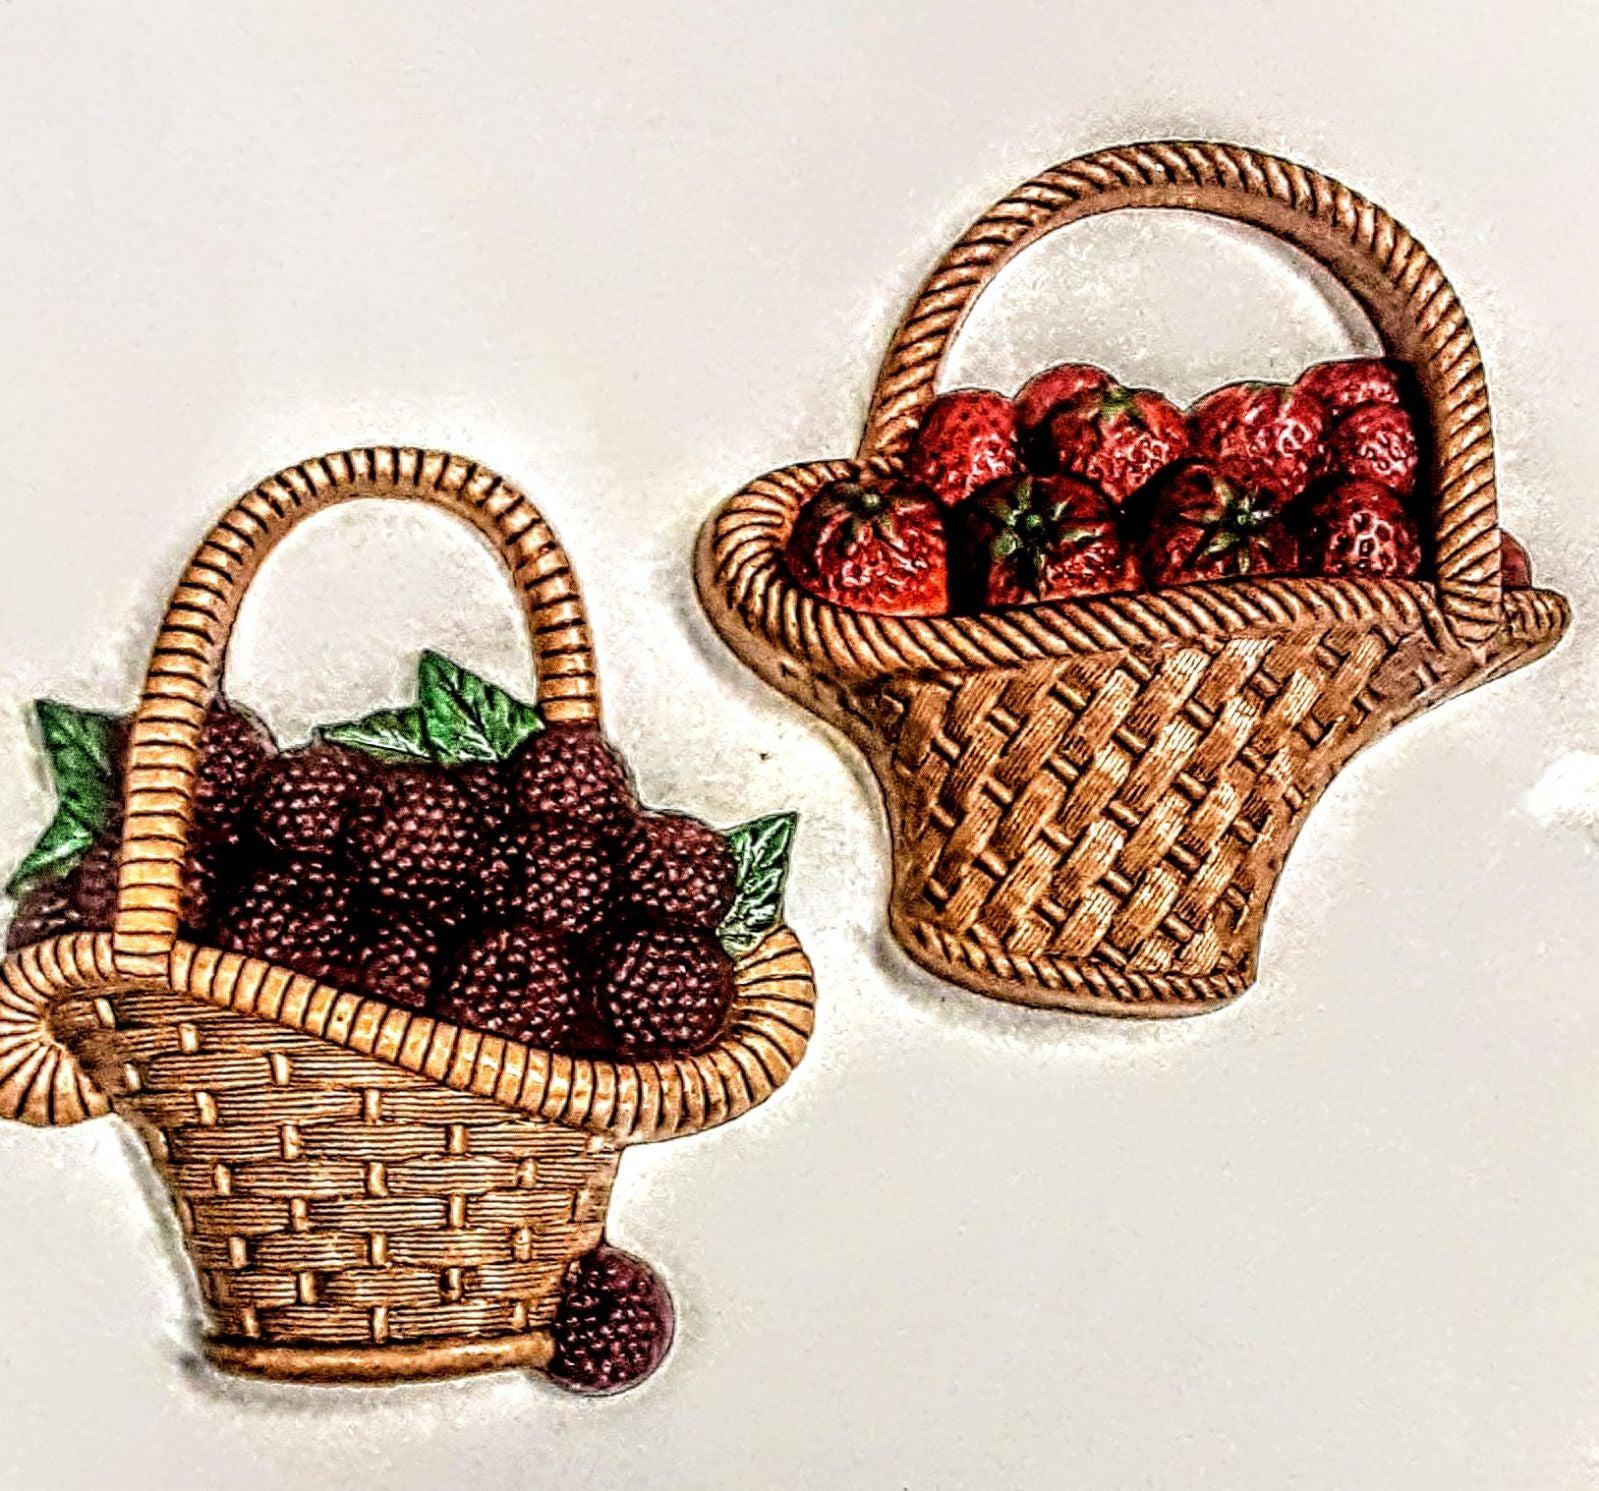 Retro Wall Decor Raspberry & Strawberry